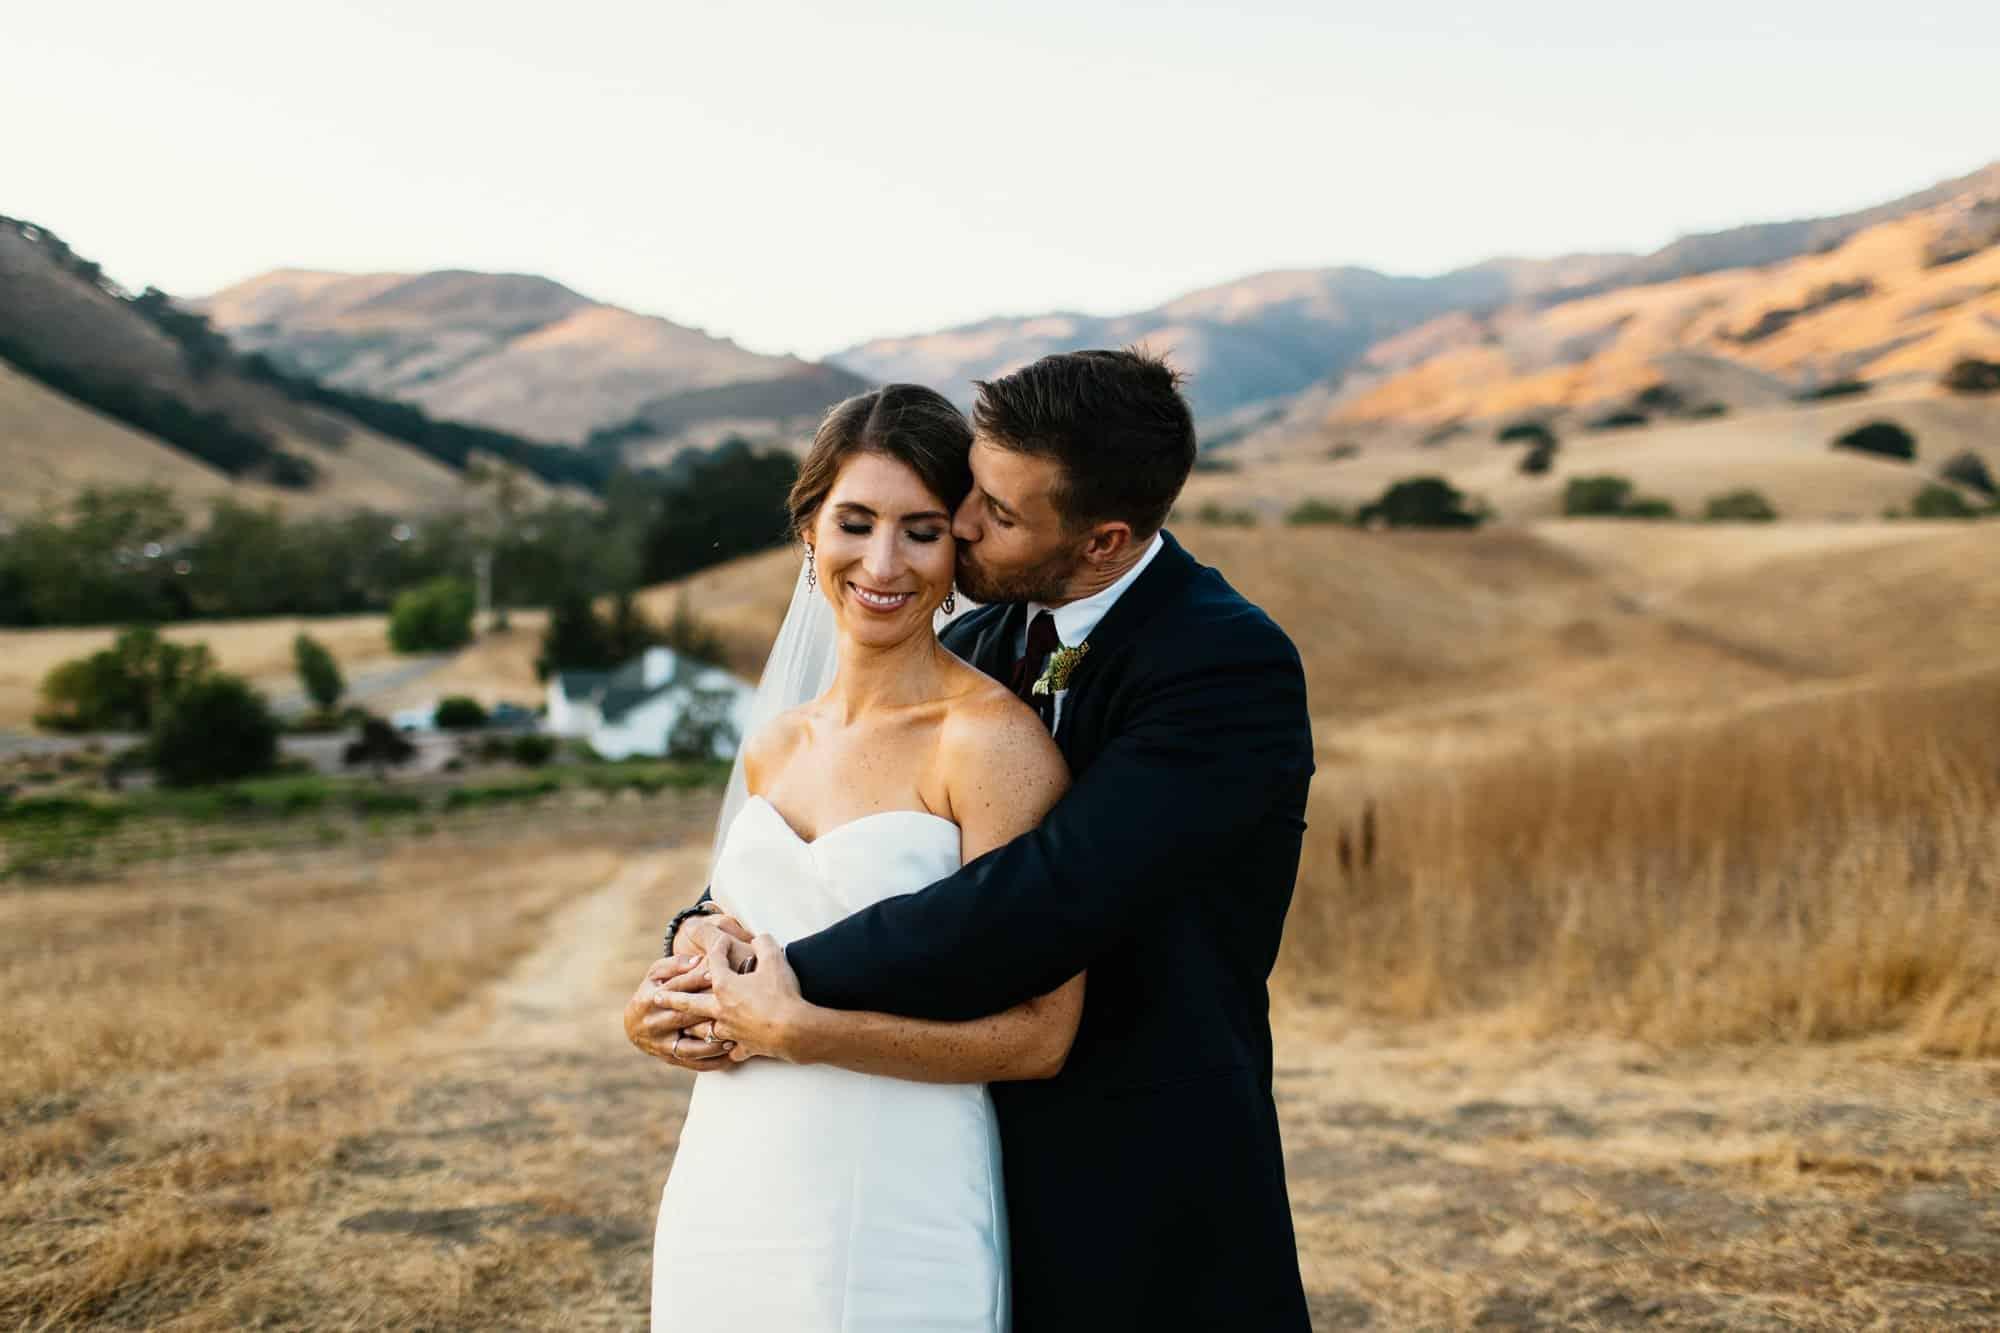 Higuera Ranch Weddings